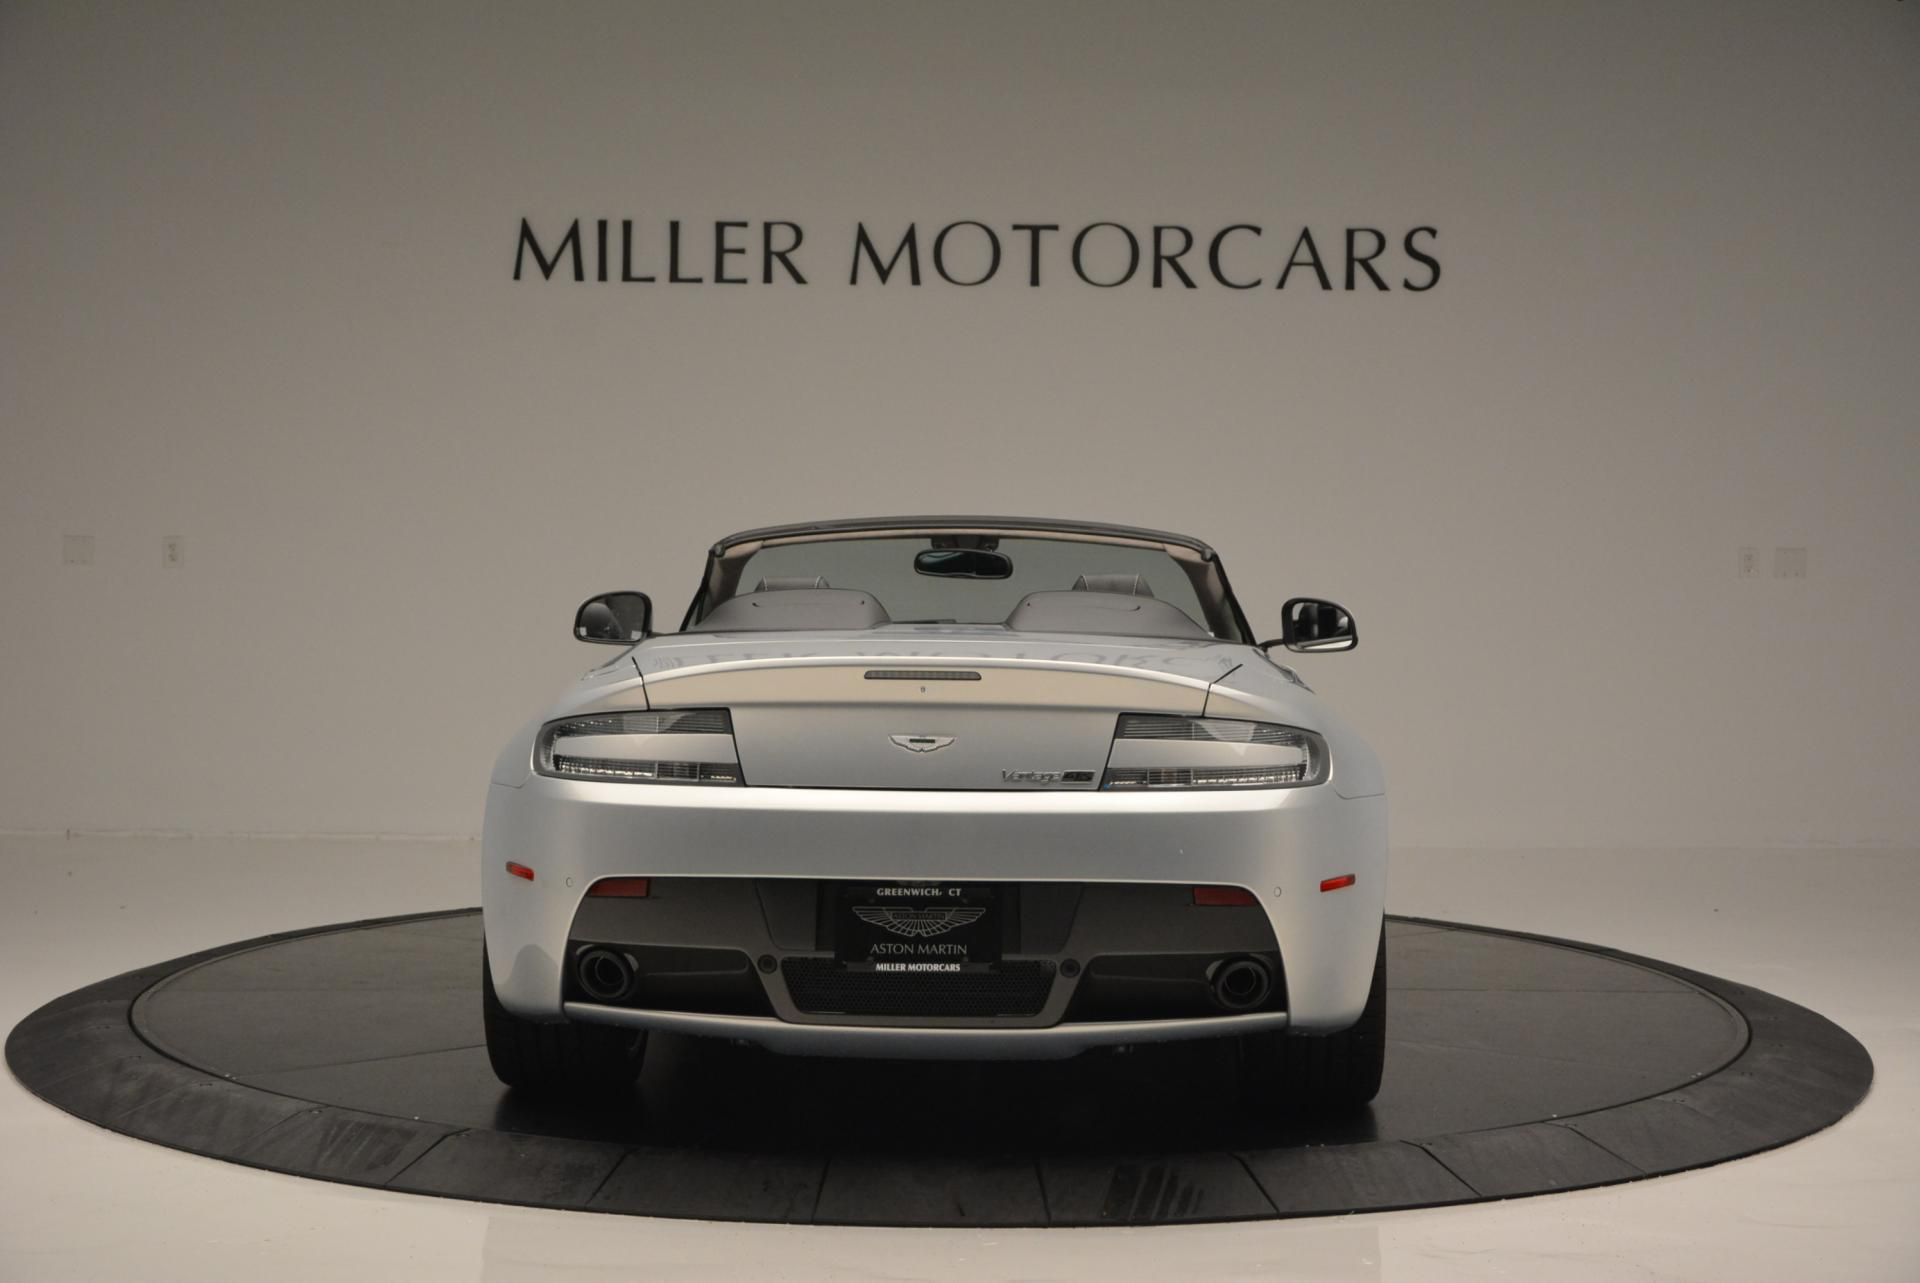 New 2016 Aston Martin V8 Vantage GTS Roadster For Sale In Westport, CT 90_p6